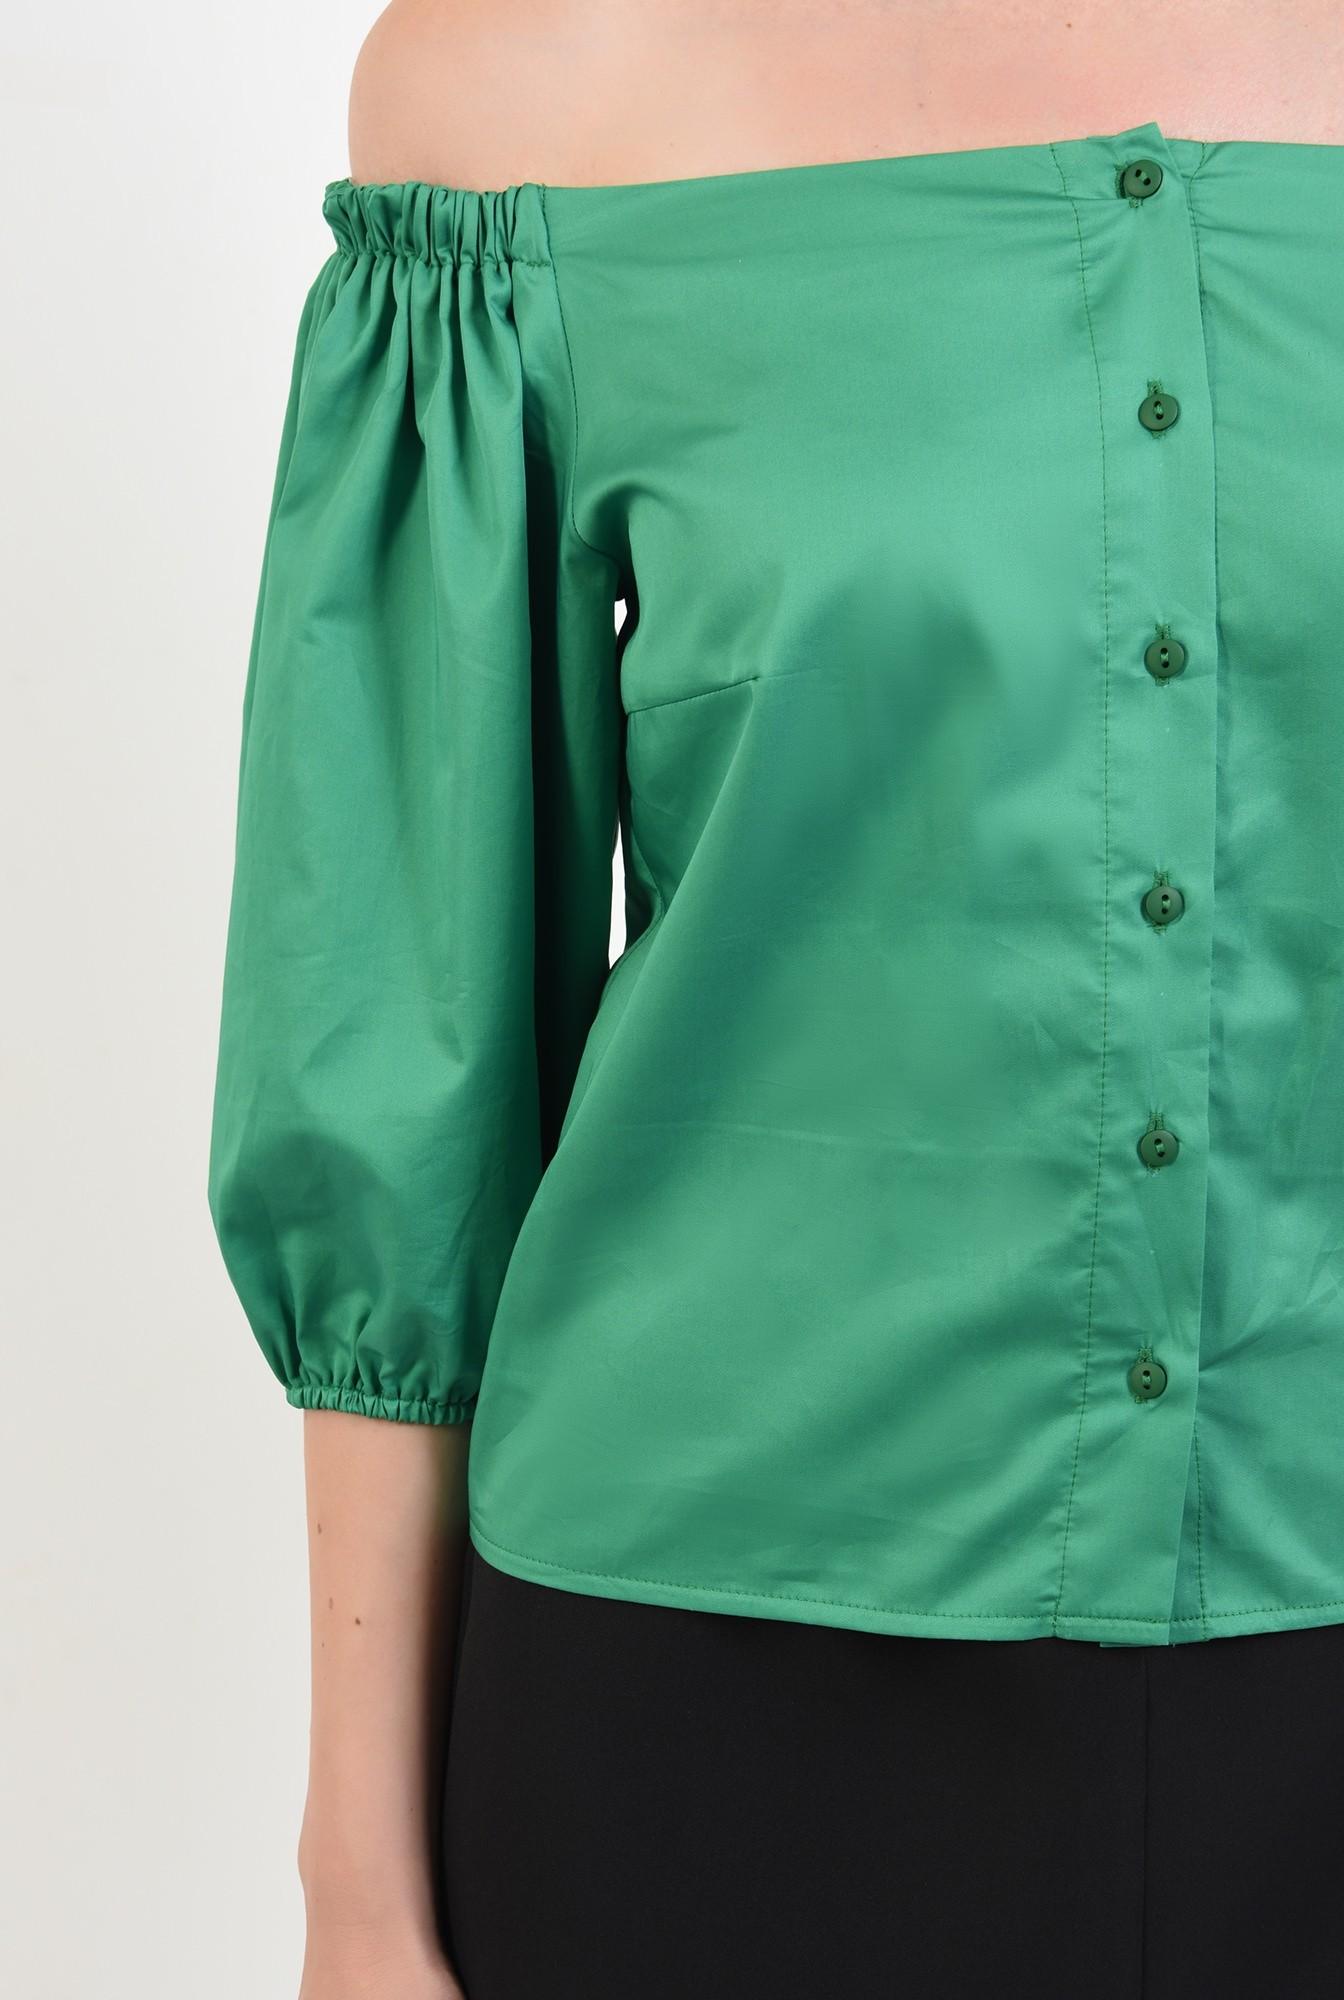 2 - 360 - bluza din bumbac, cu nasturi, verde, Poema